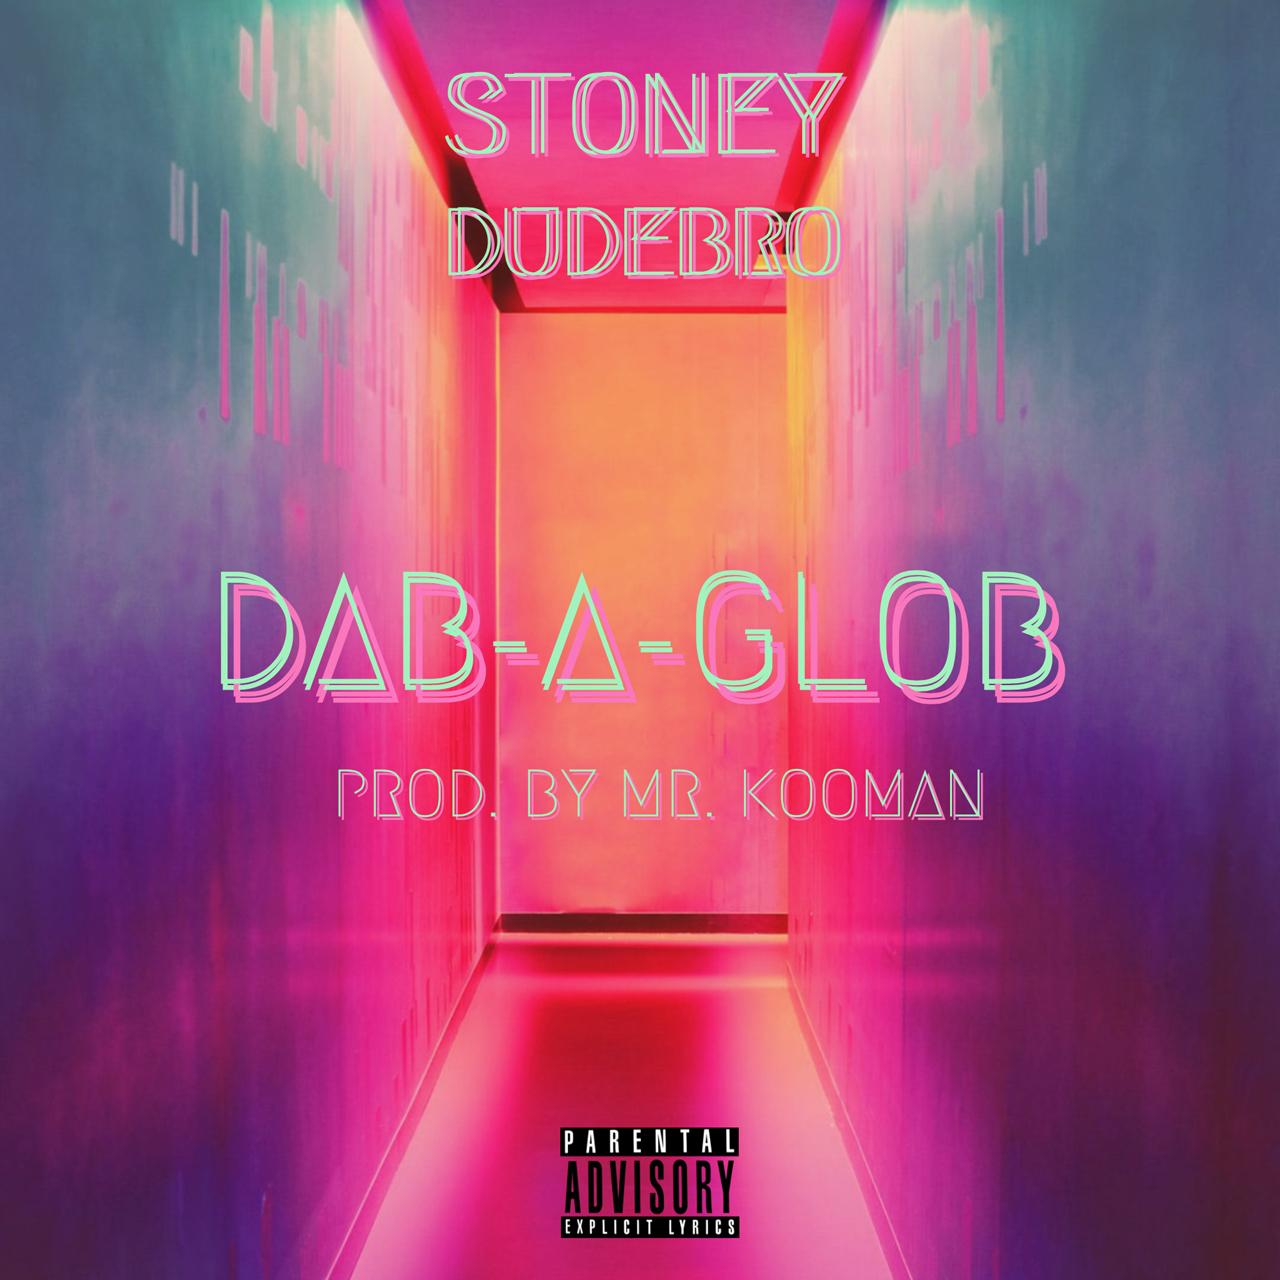 Stoney Dudebro - Dab-A-Glob